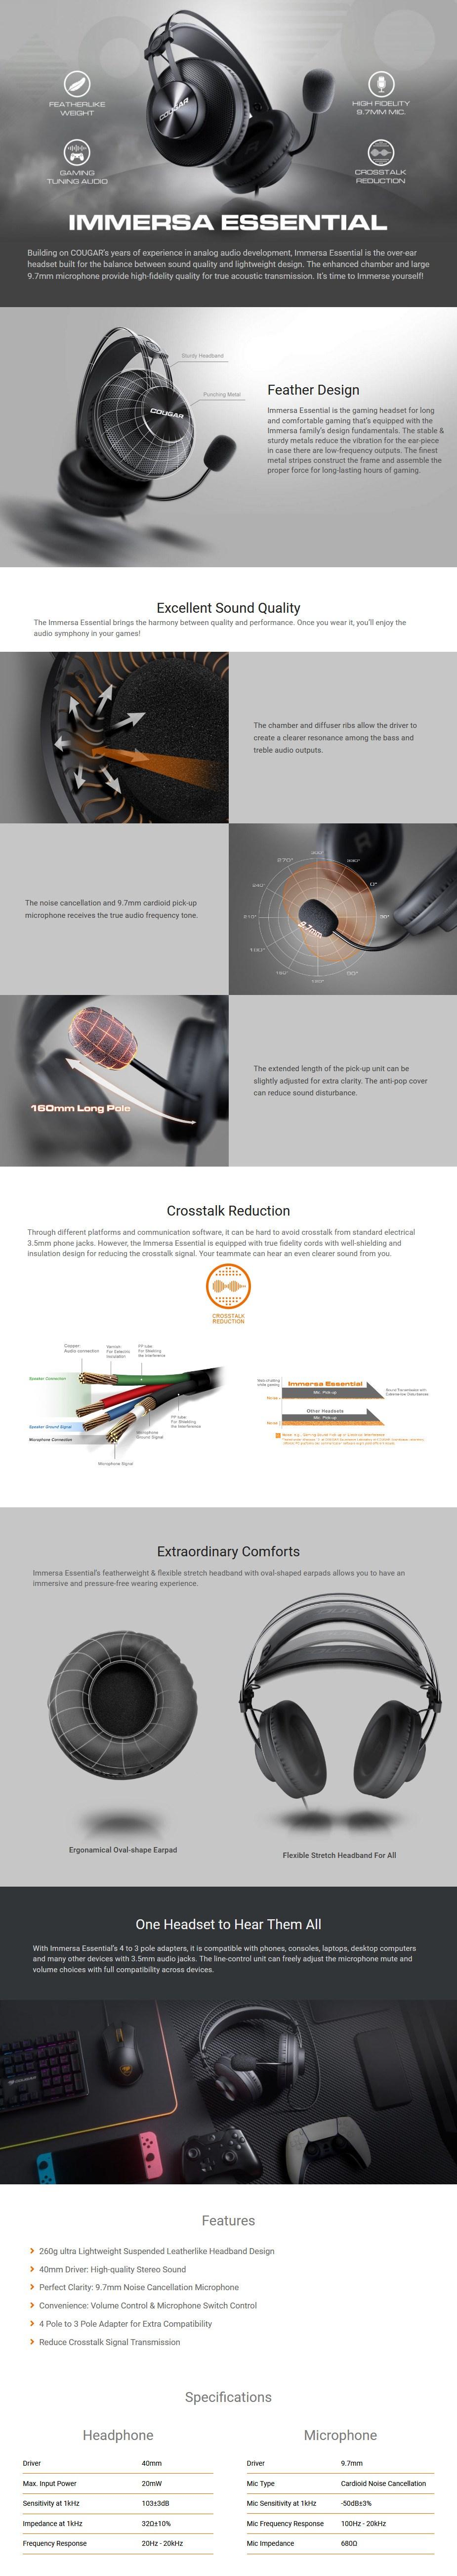 cougar-immersa-essential-gaming-headset-ac39915-8.jpg